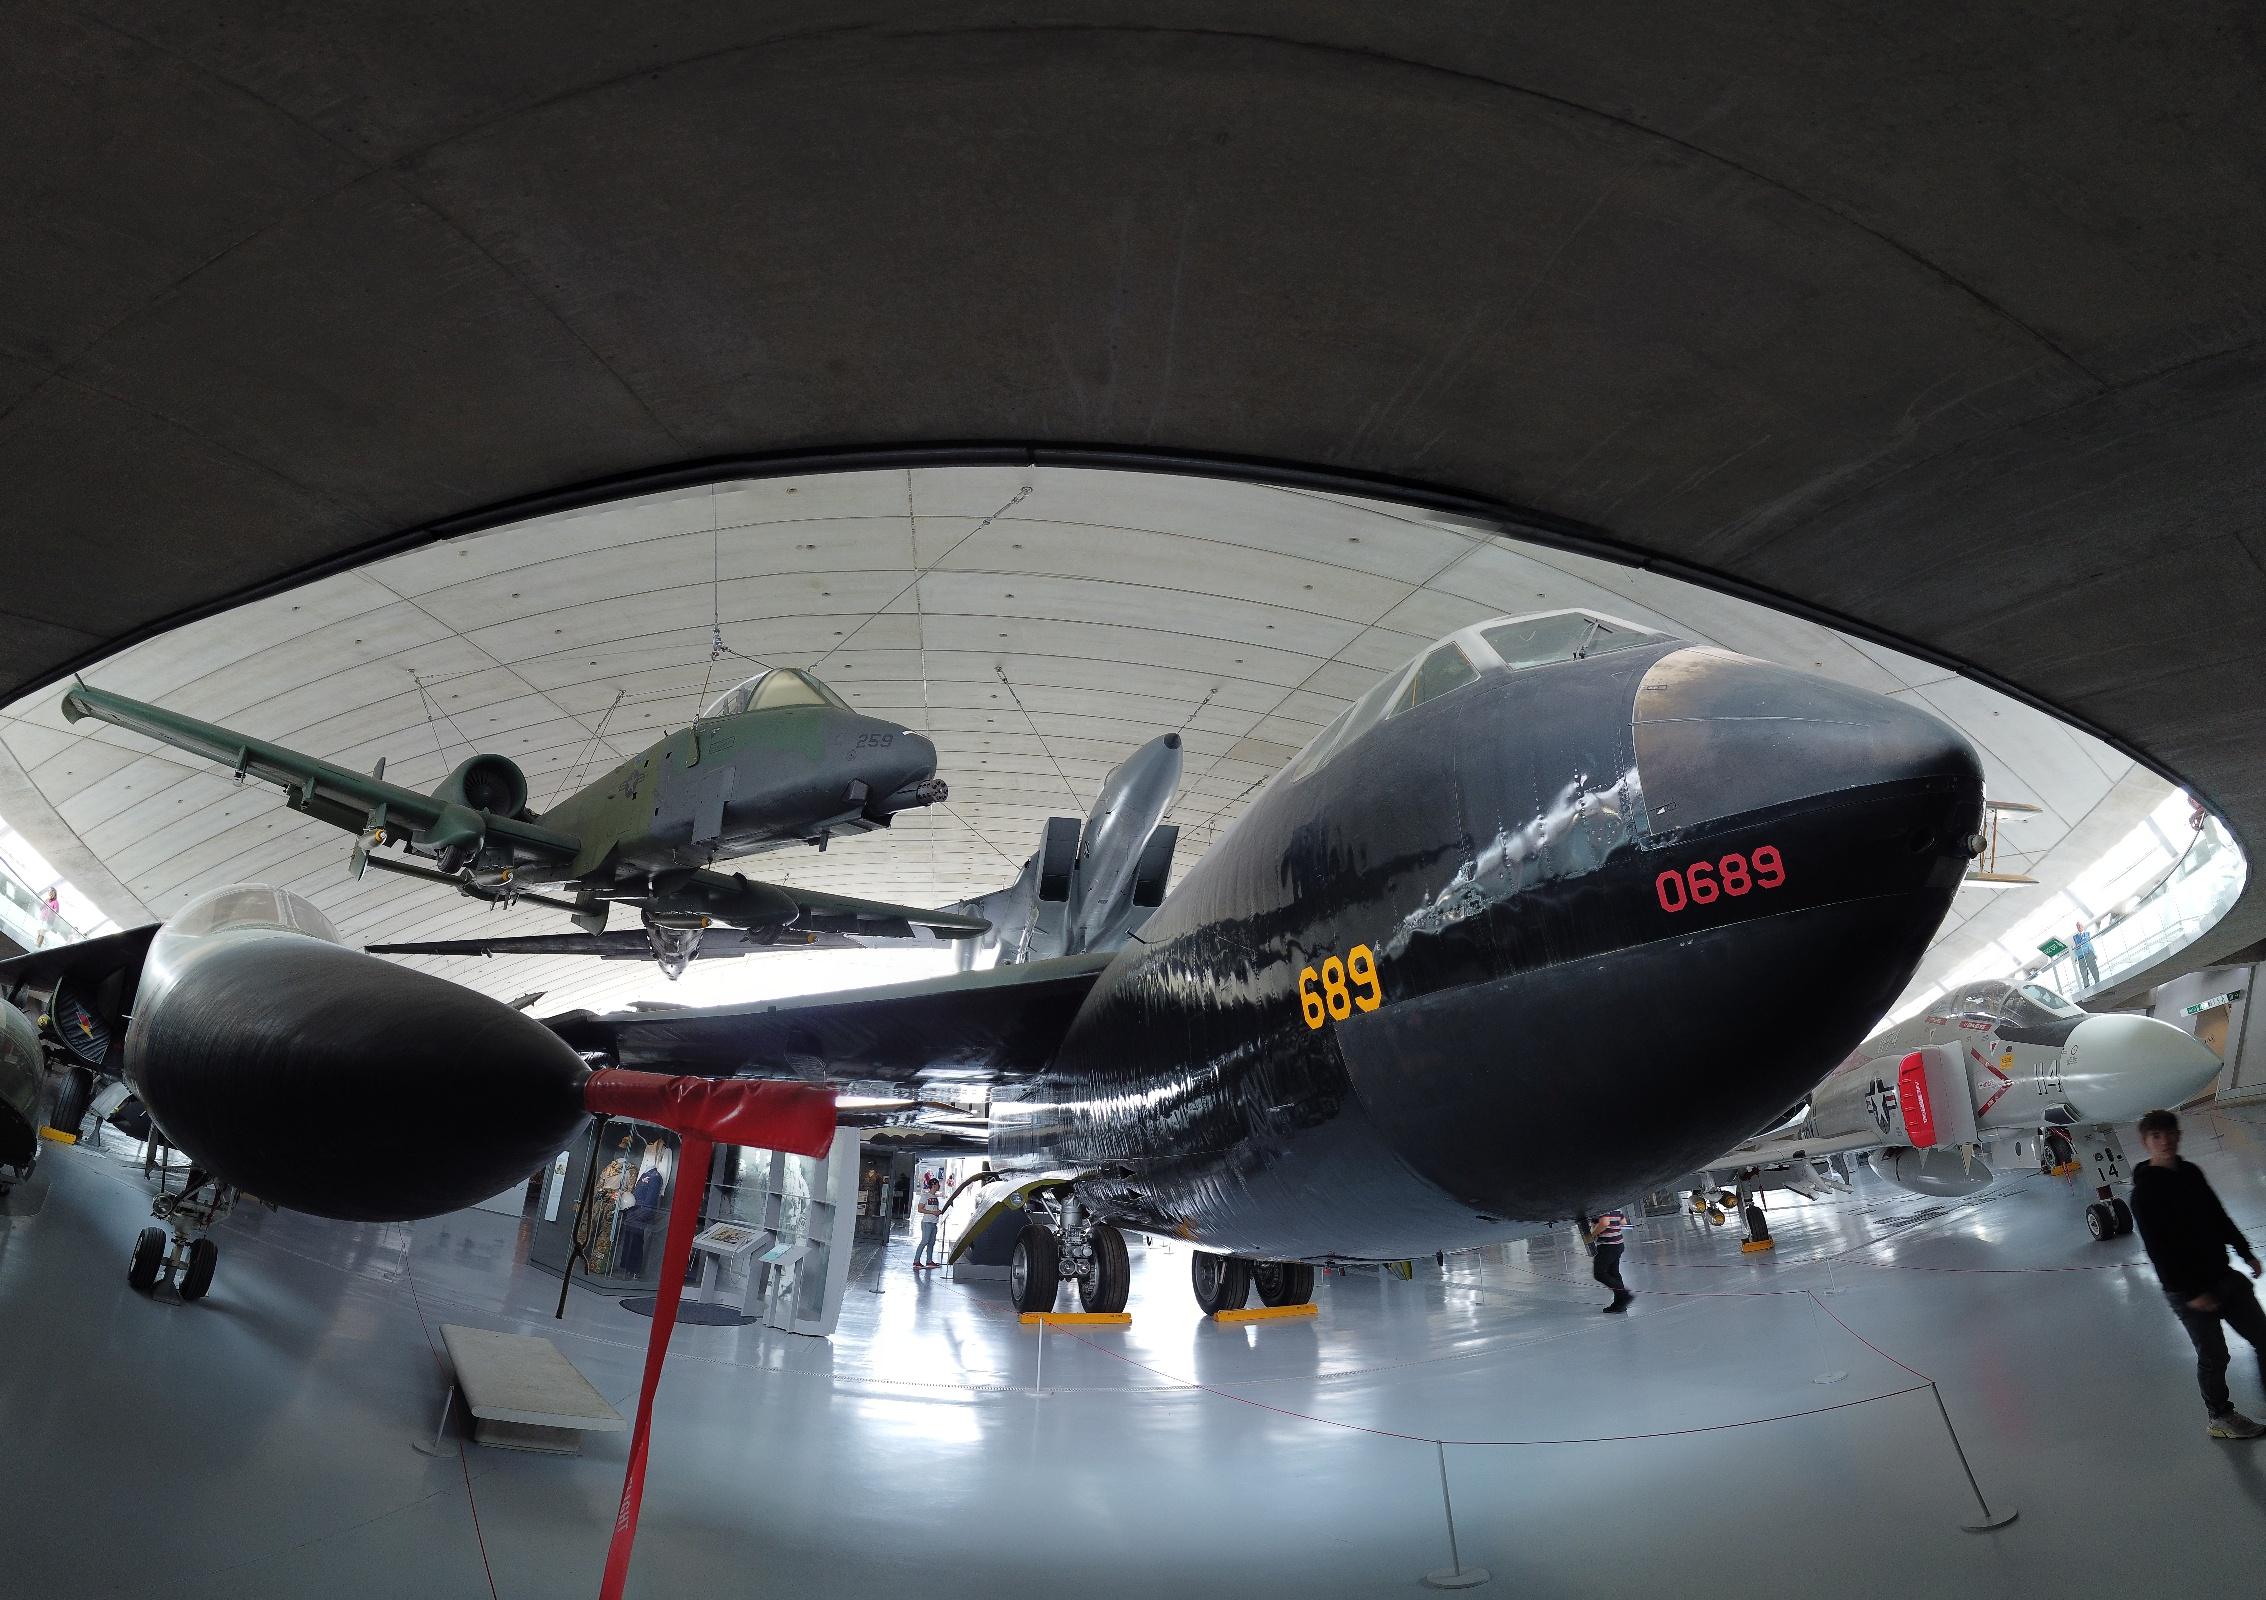 Duxford American Air Museum